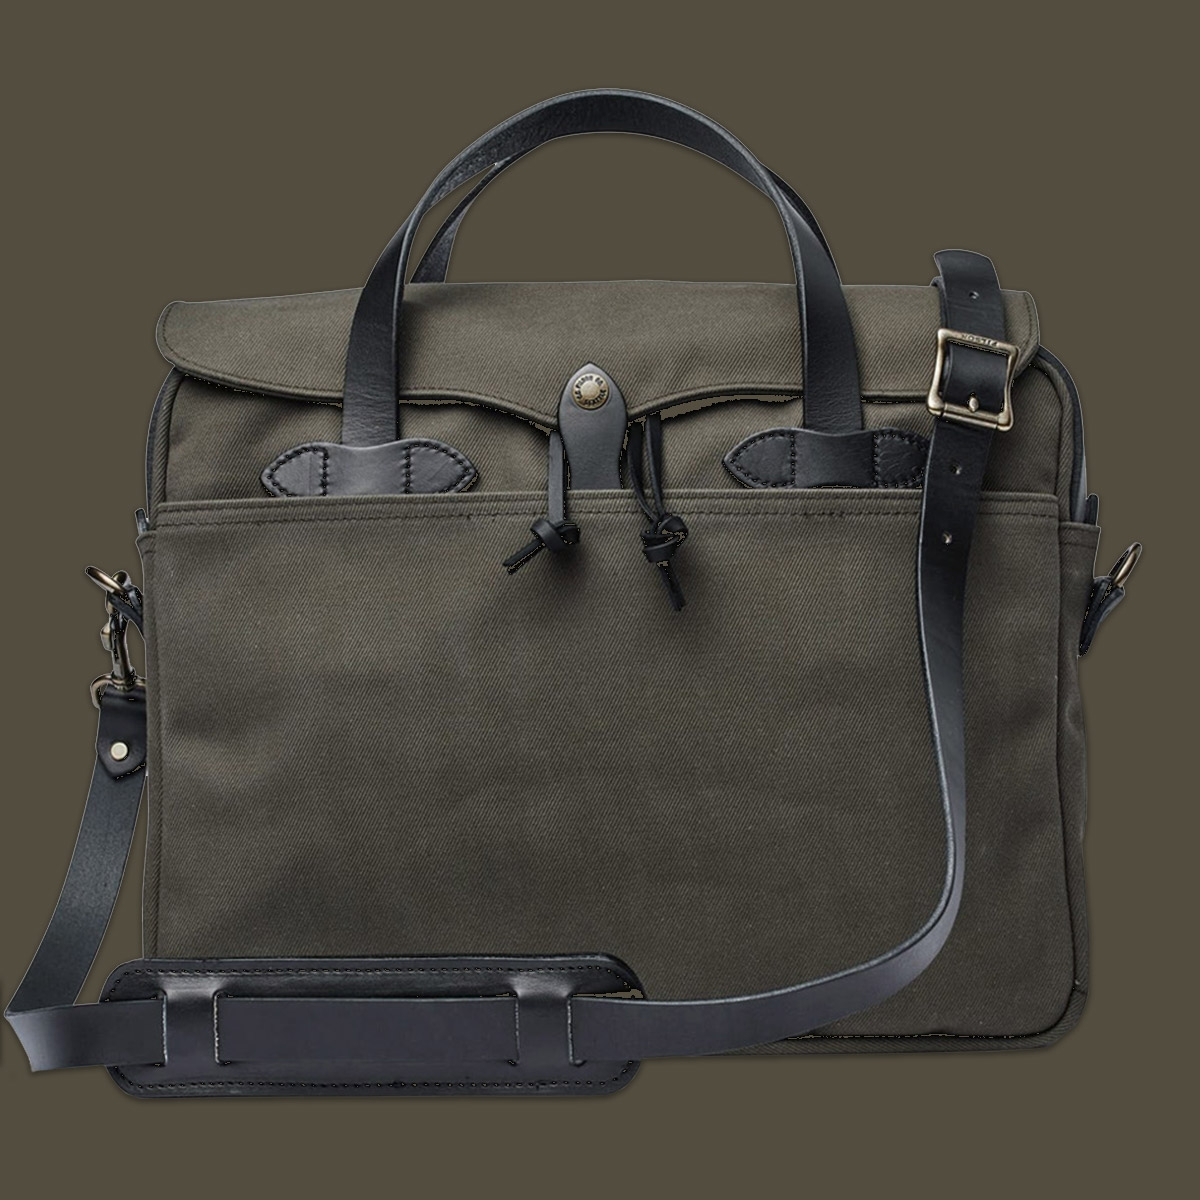 Filson Original Briefcase 11070256 Root, LIMITIERTE FARBE, lifestyle